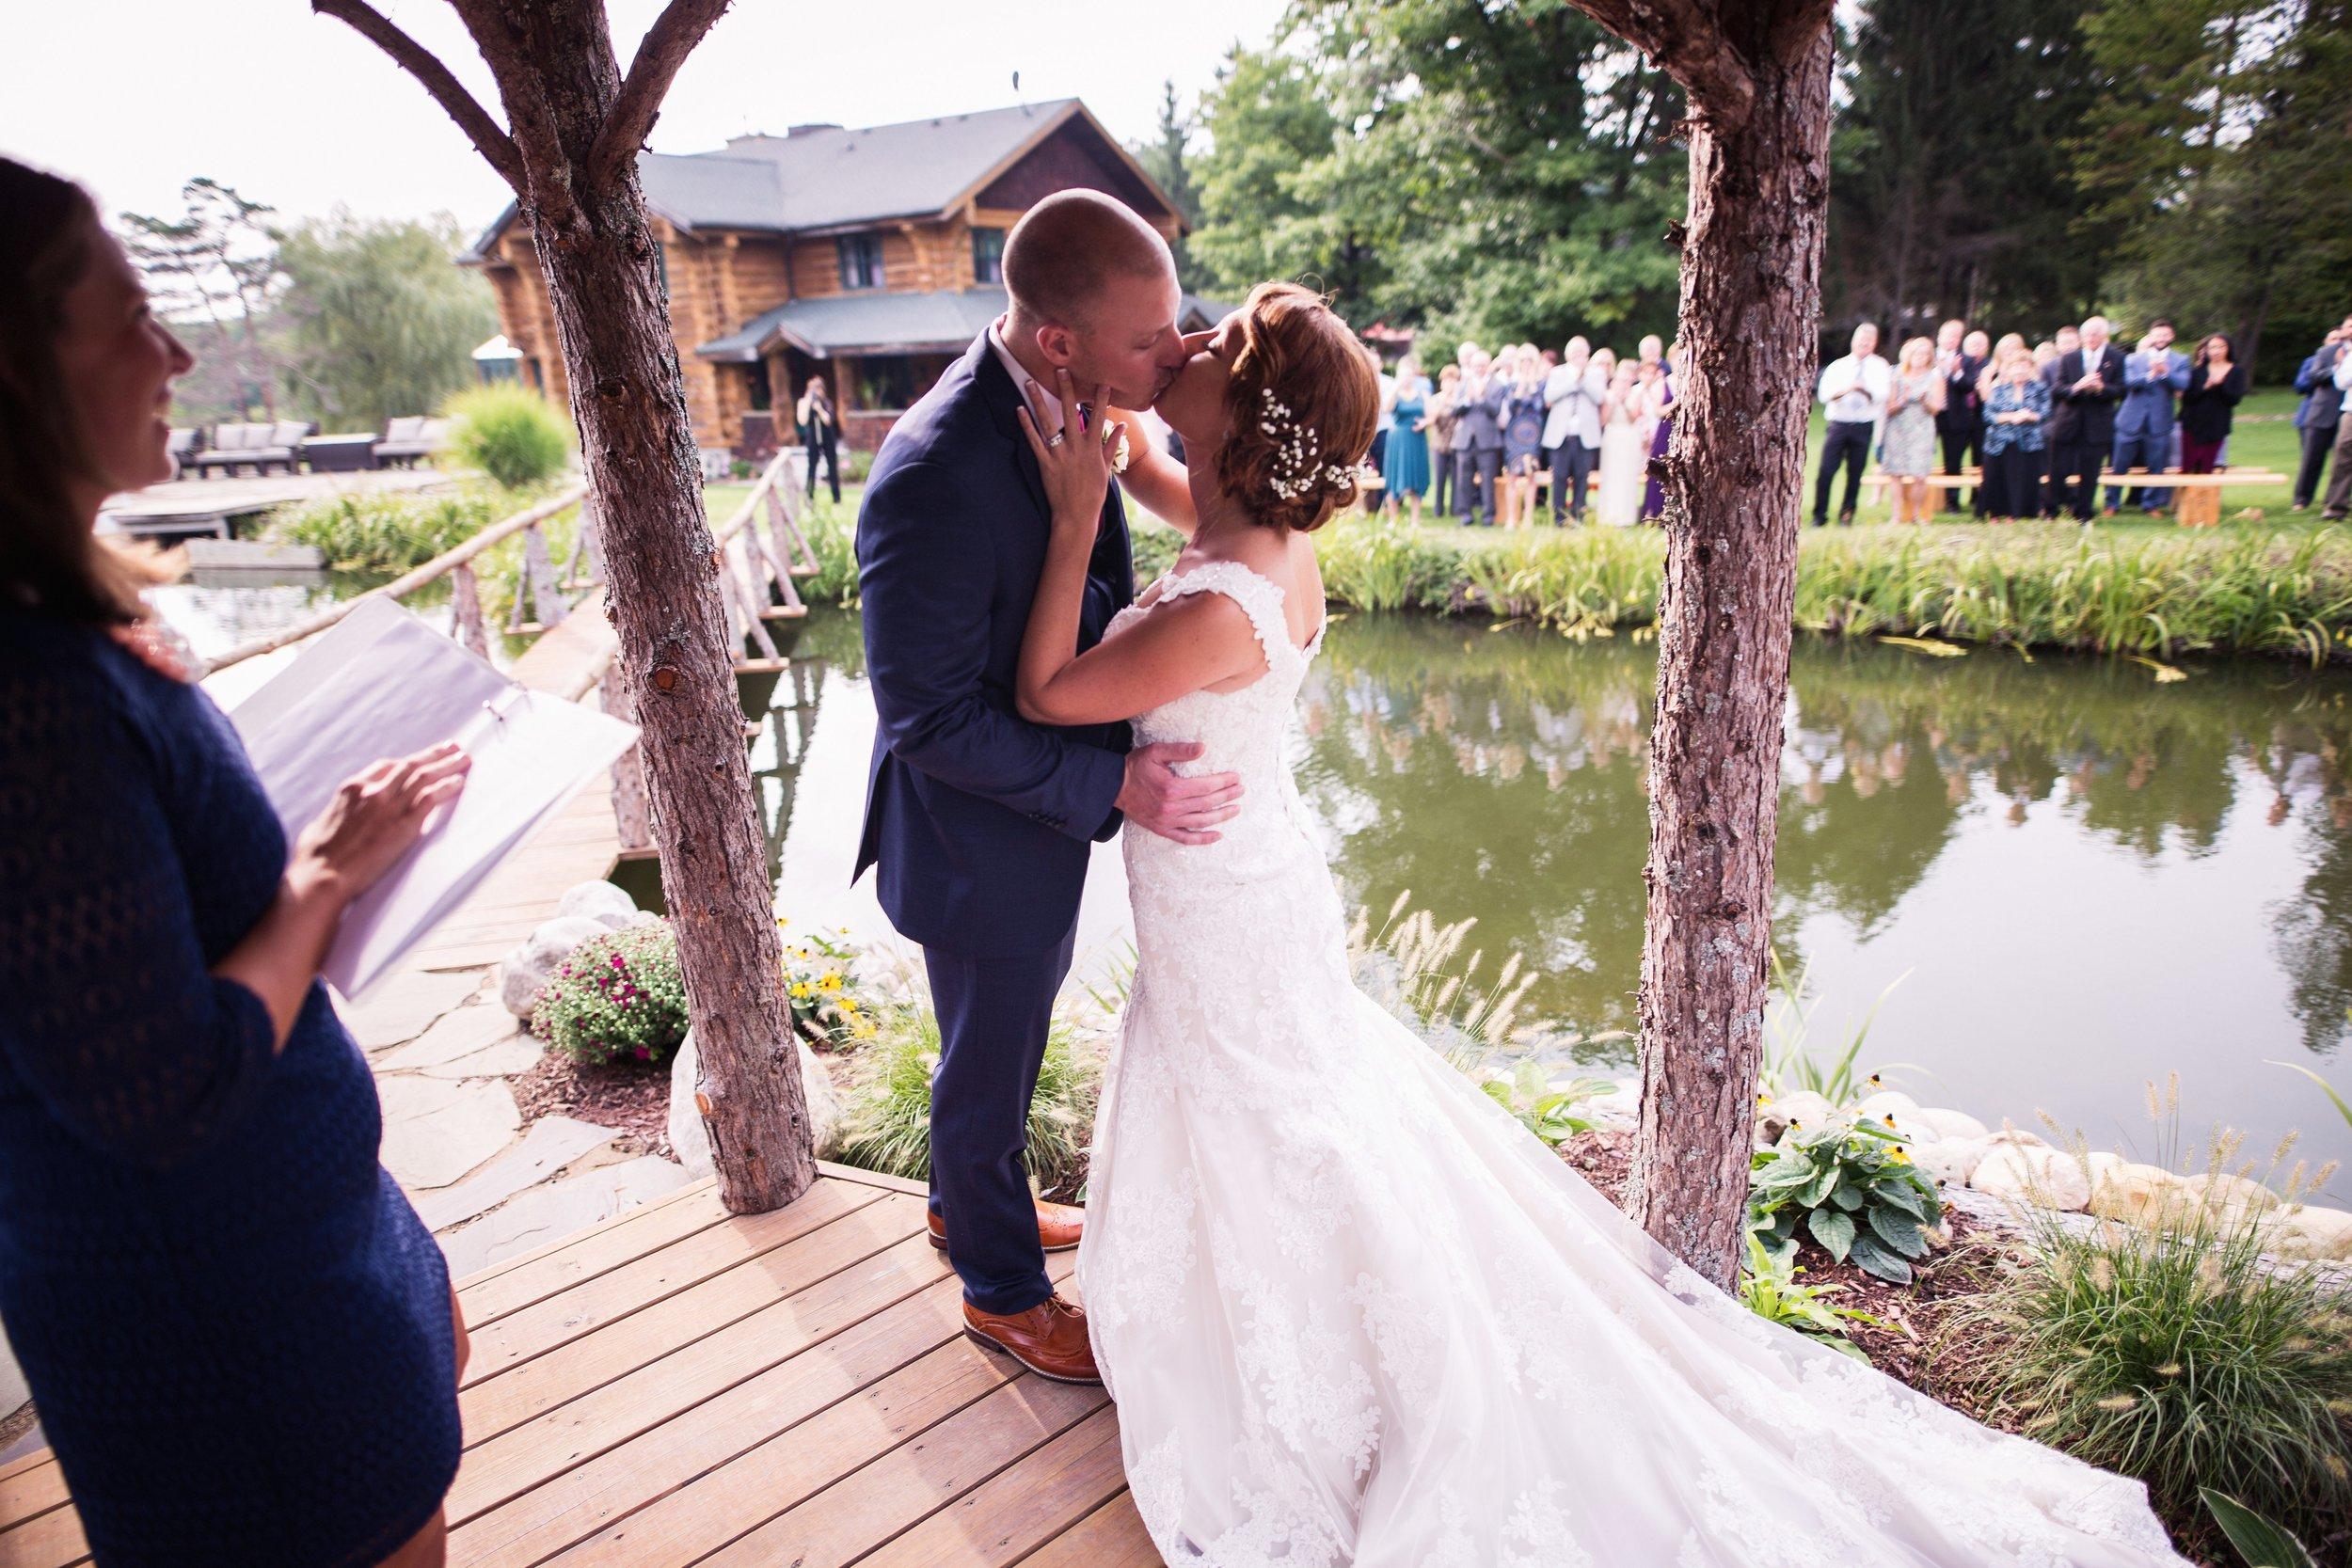 Blog-Lisa-James-Wedding-at Rosebud Estate Weddings in Arcade NY by Stefan-Ludwig-Photography-Buffalo-NY-49-x.jpg